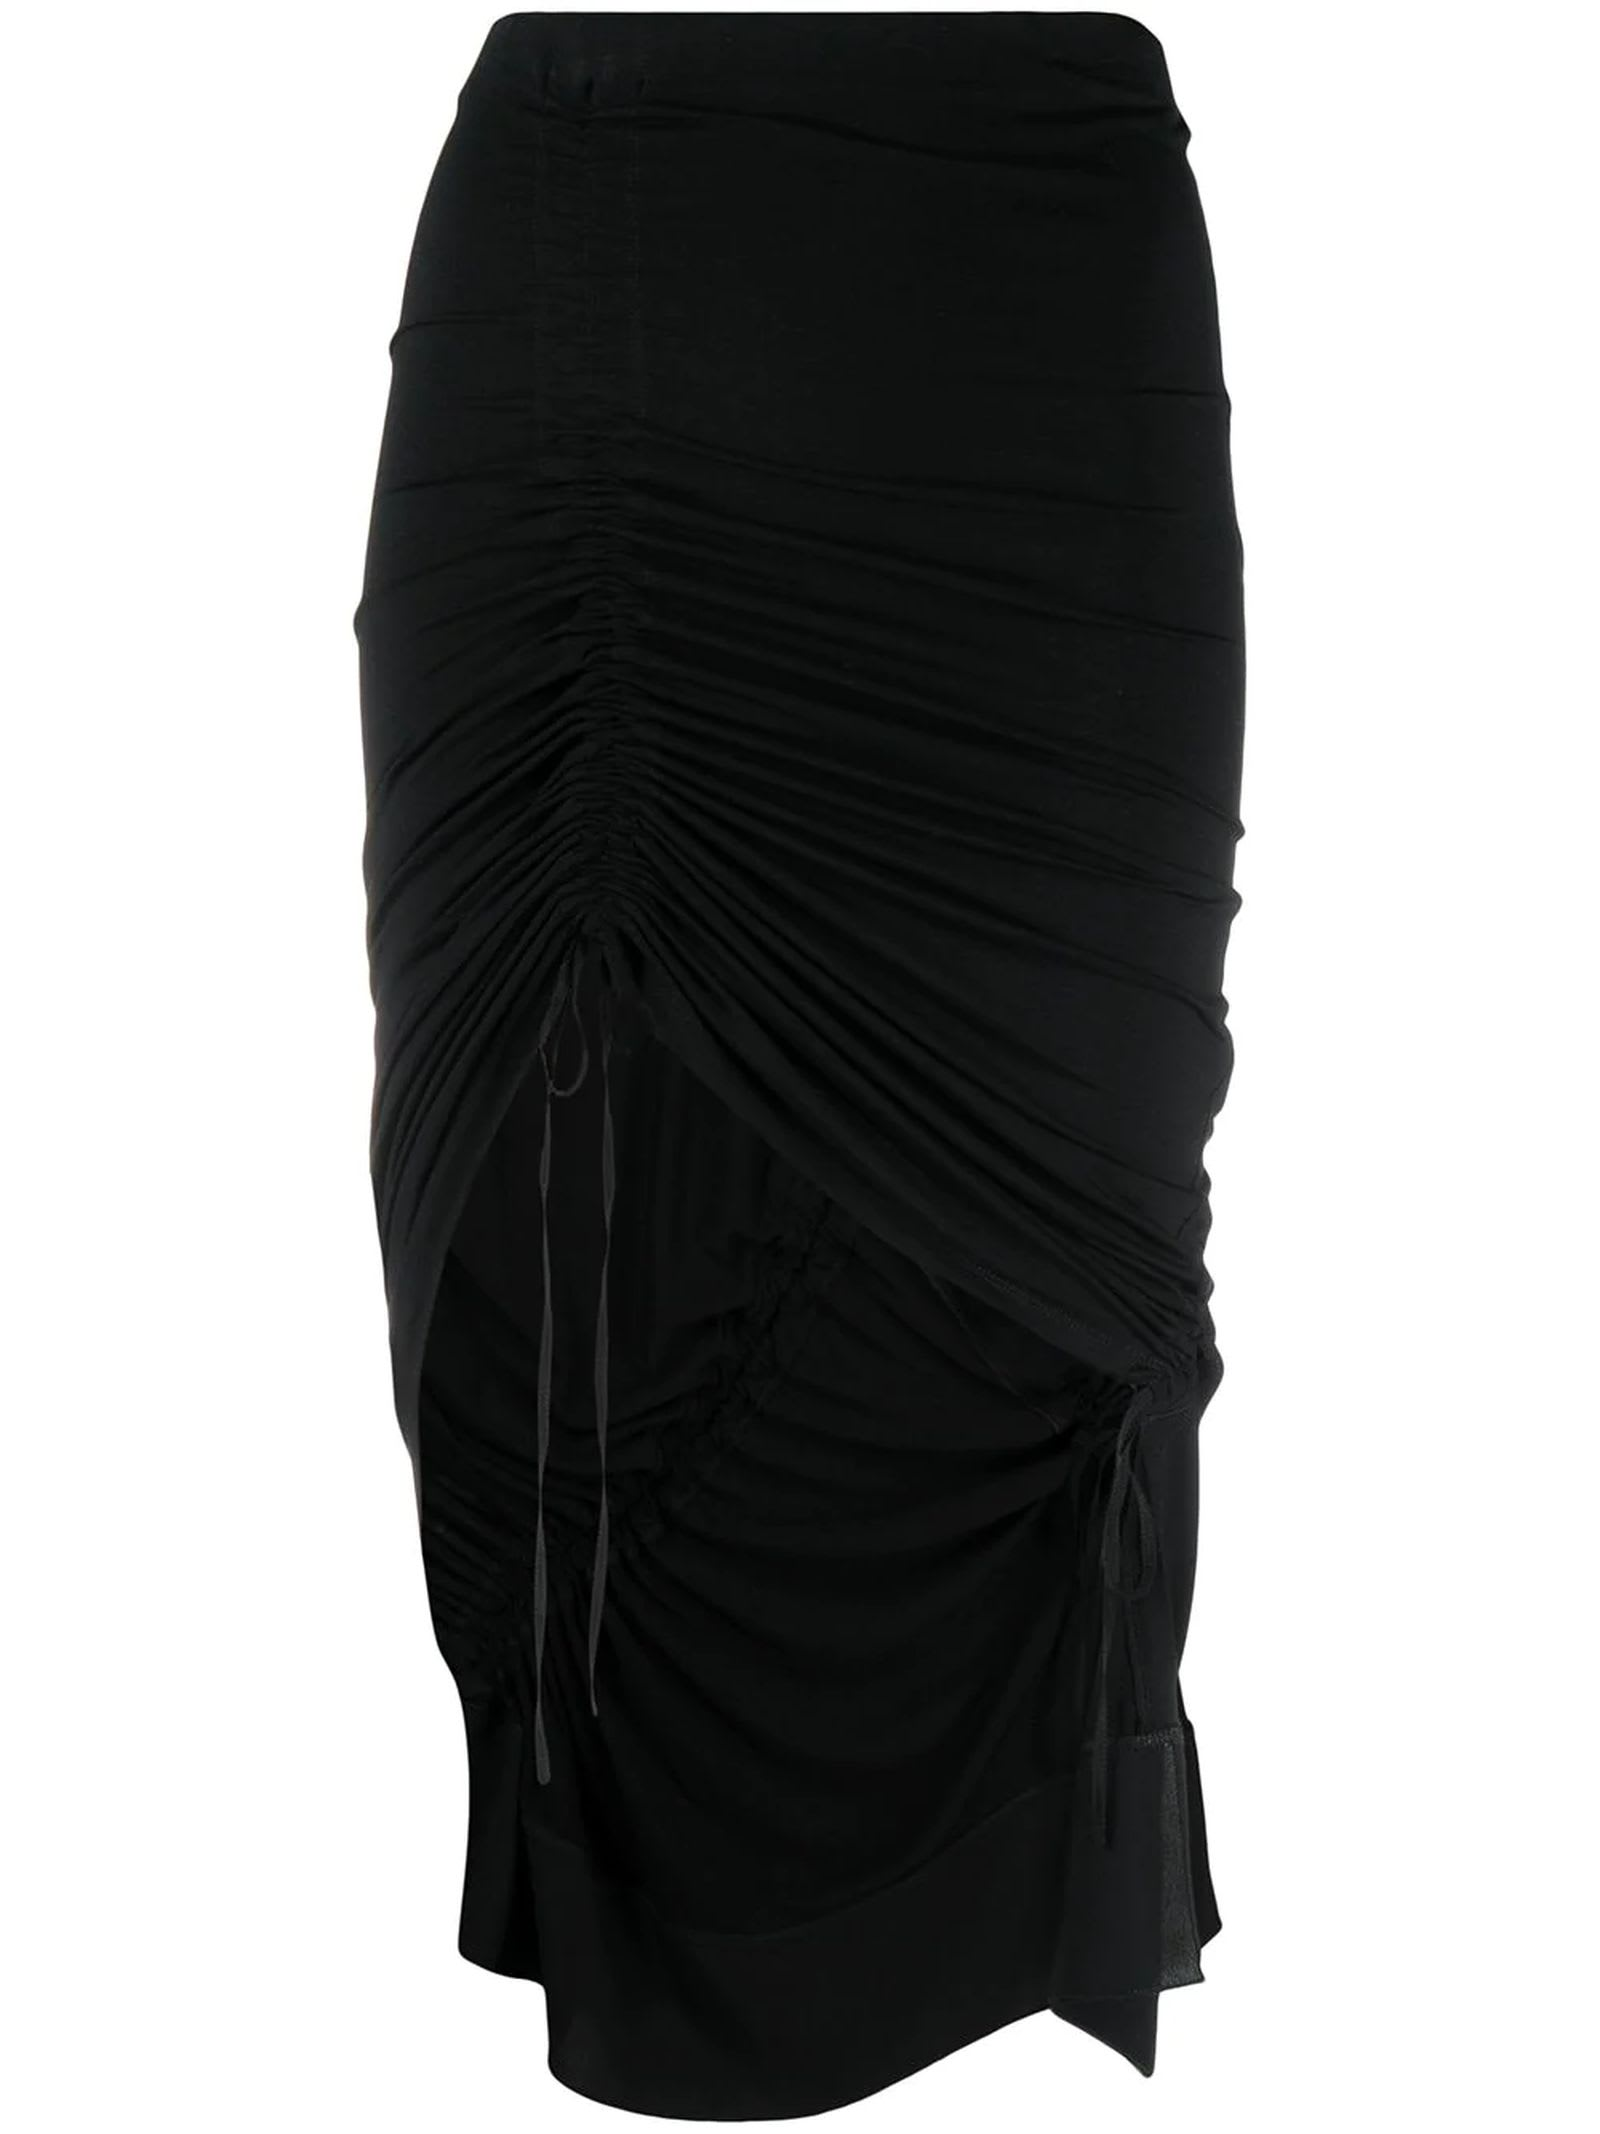 N°21 Mini skirts BLACK SKIRT